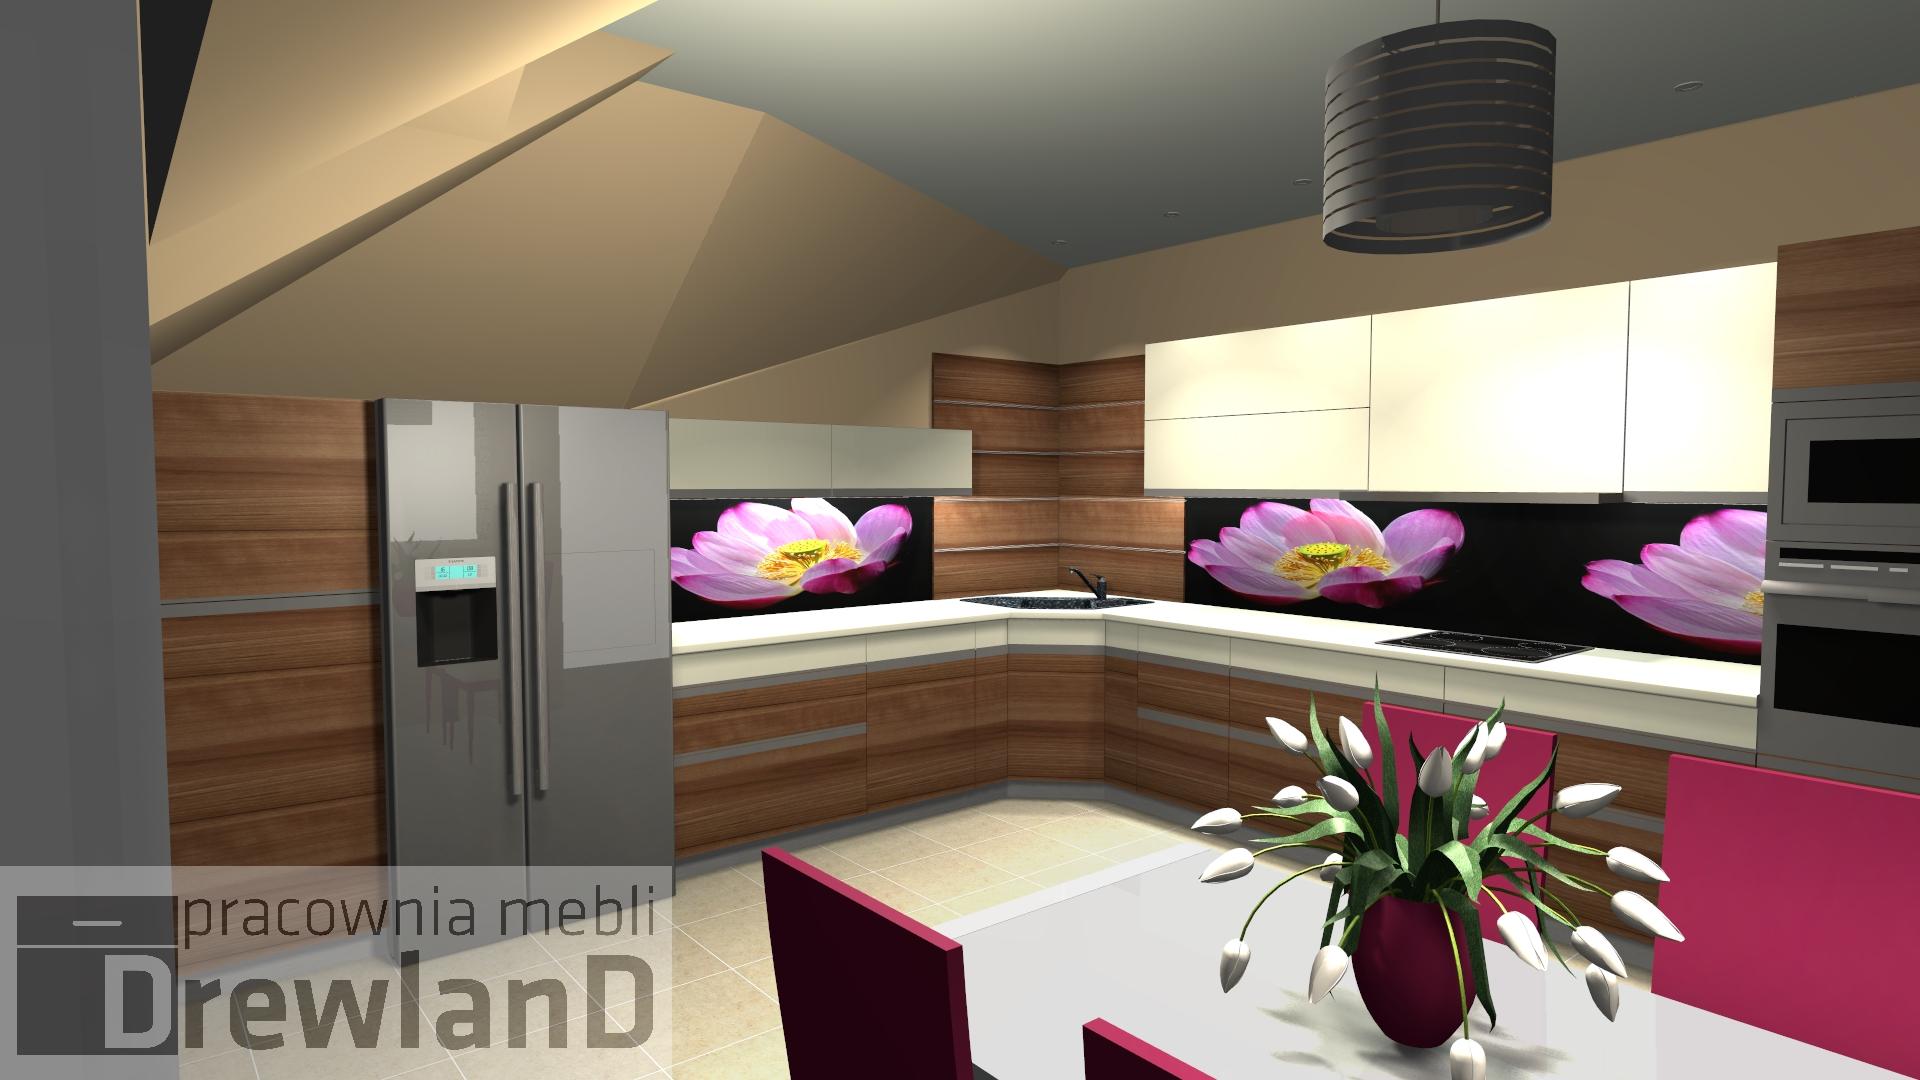 Projekt Kuchni Na Poddaszu Drewno I Kolor Bialy Panel Szklany